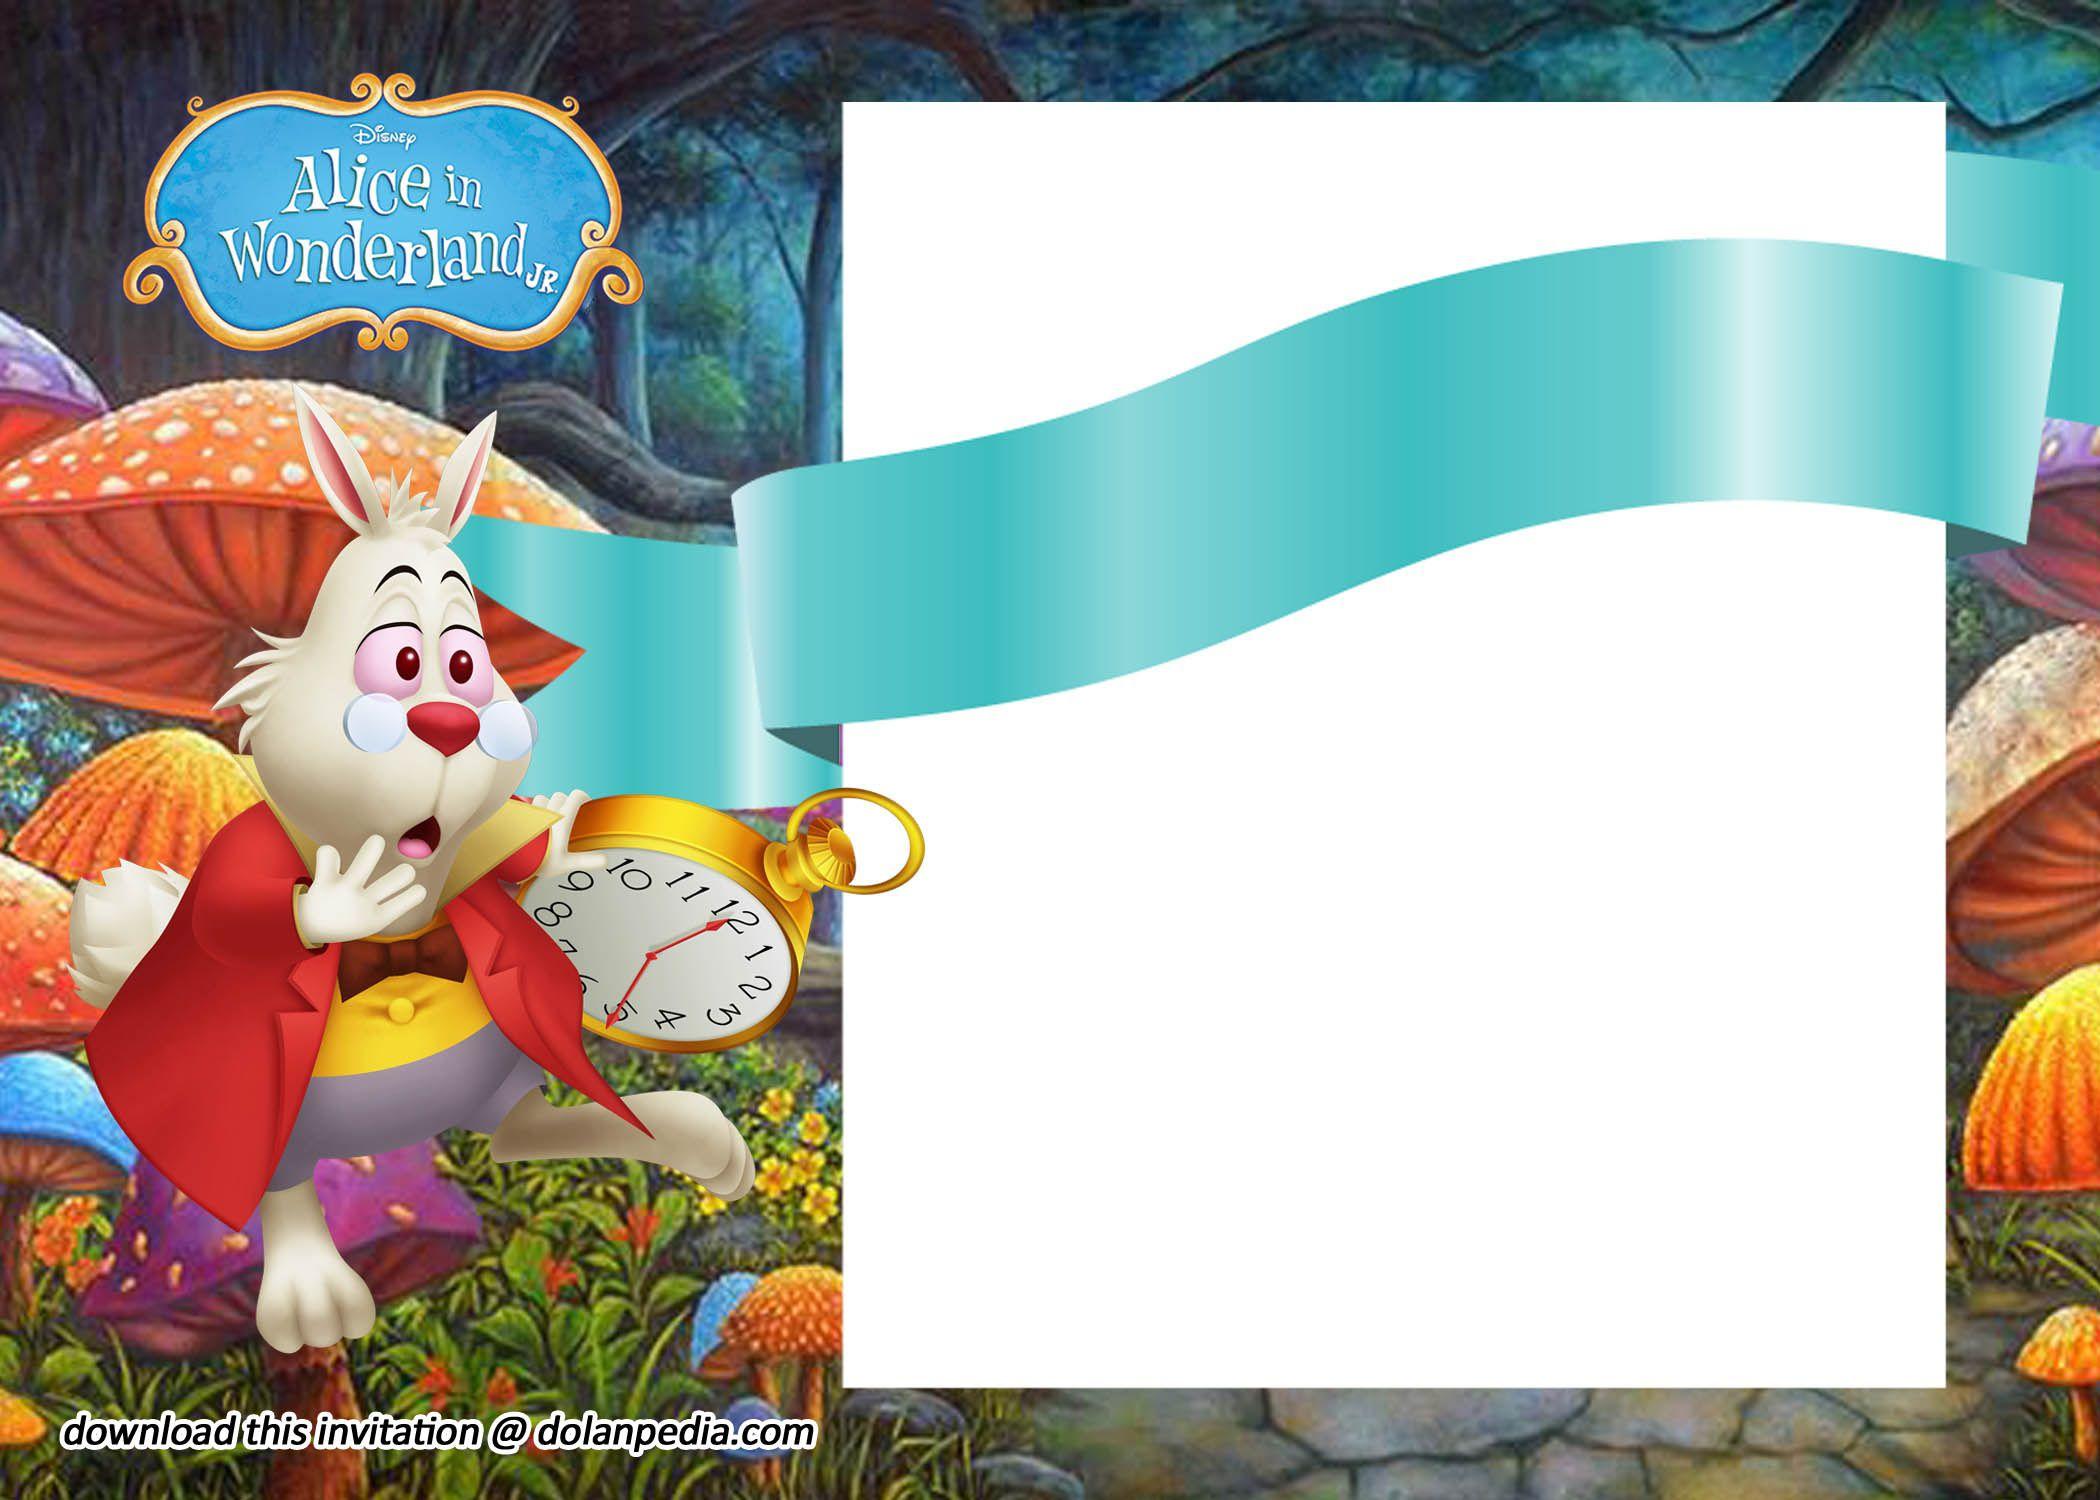 006 Striking Alice In Wonderland Tea Party Template High Def  Templates Invitation FreeFull